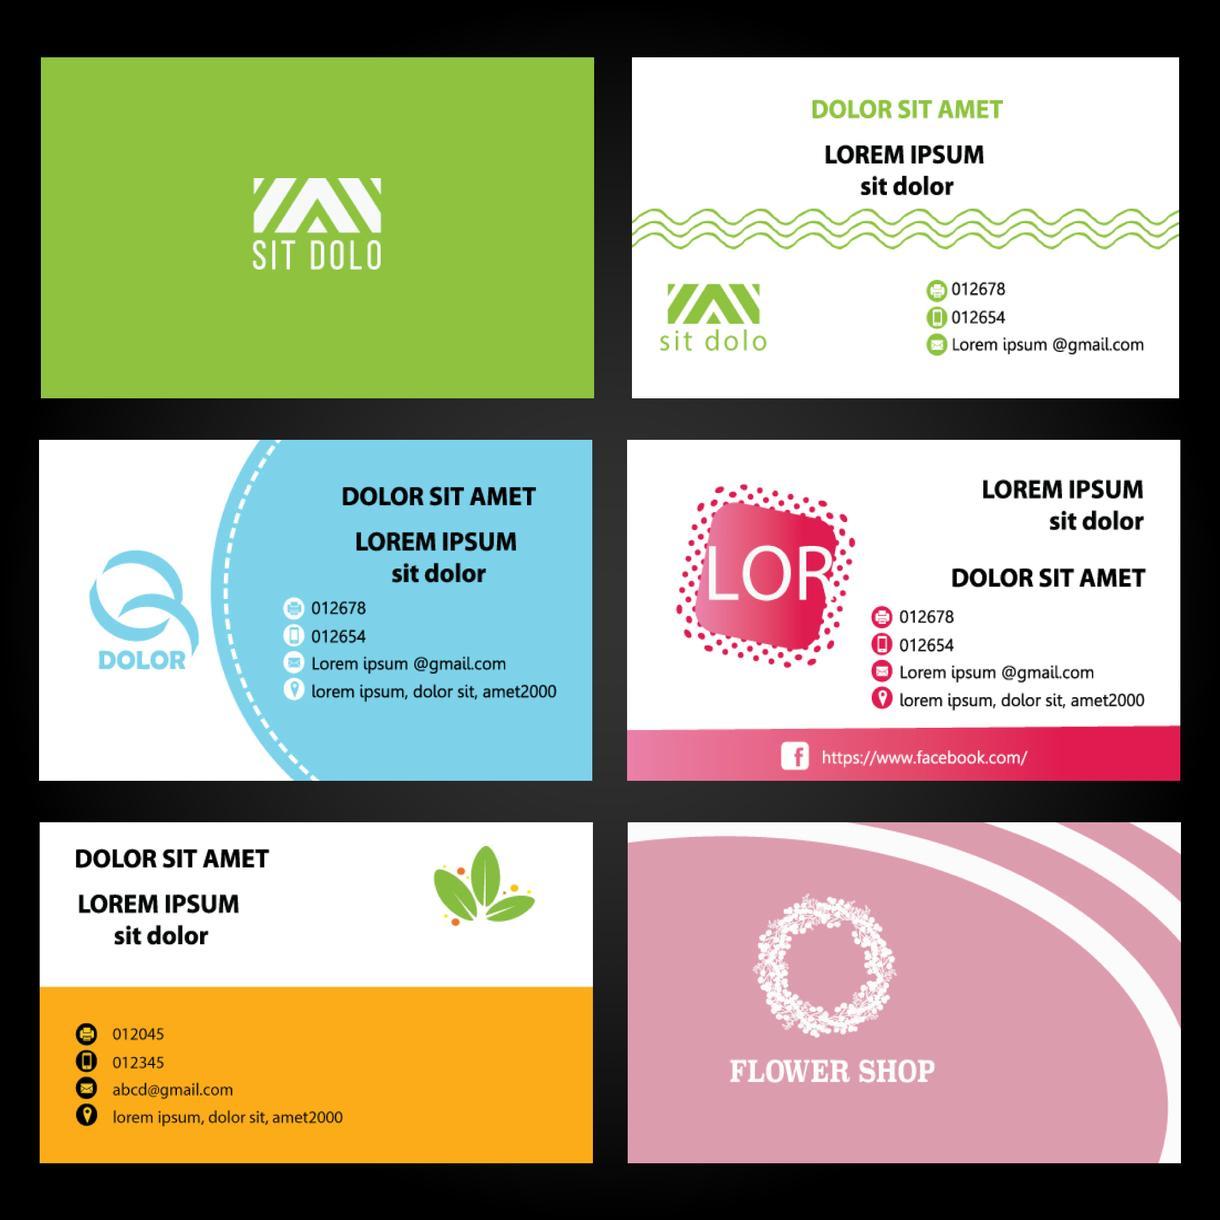 Aiデータは無料で提供!素敵な名刺を制作致します ハイクオリティ!名刺デザイン2提案を作成致します!